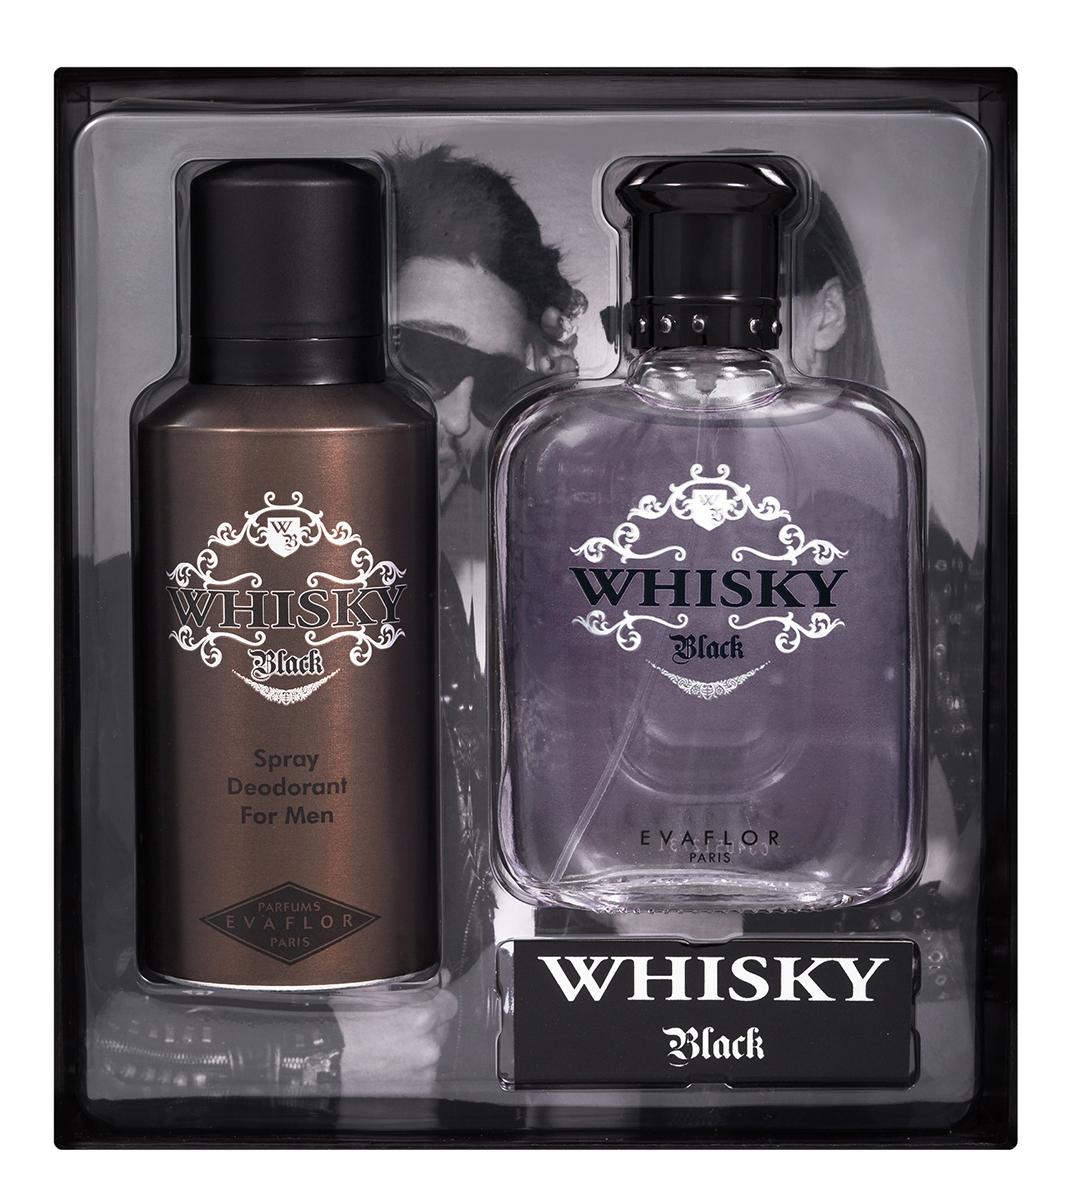 Evaflor Подарочный набор Whisky Black мужской: Туалетная вода, 100 мл , дезодорант, 150 мл42900Подарочный набор для мужчин : туалетная вода 100мл, парфюмированный дезодорант 150 мл.